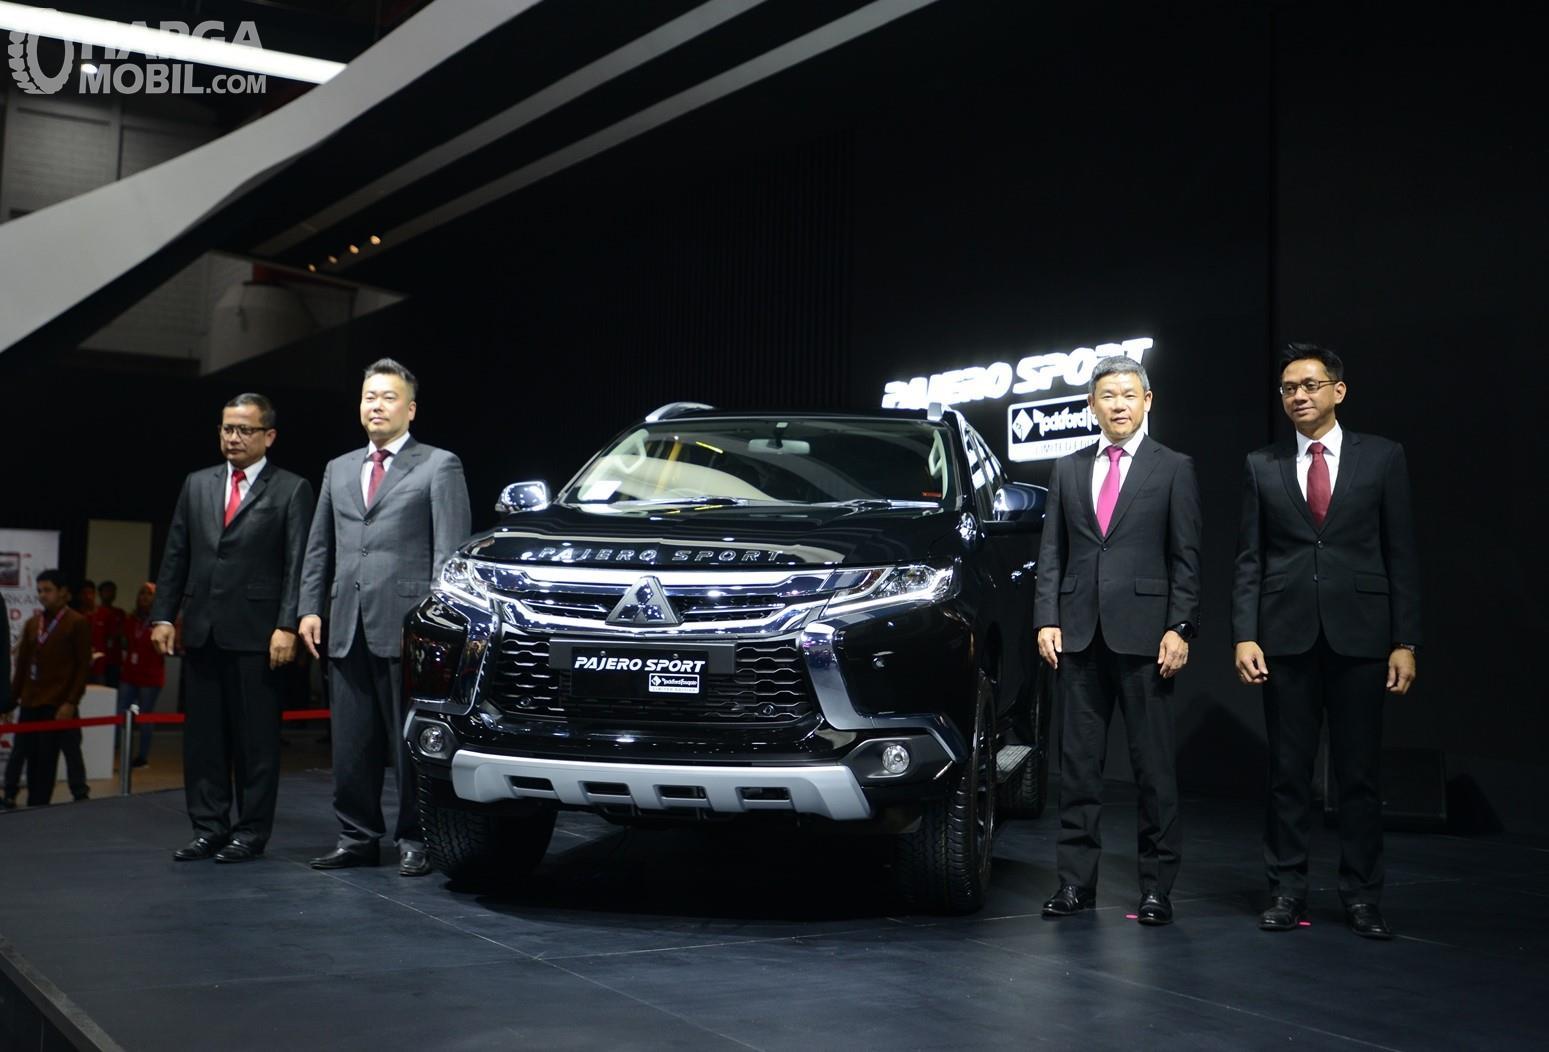 Foto Mitsubishi Pajero Sport RF Limited Edition 2018 saat diluncurkan di IIMS 2018